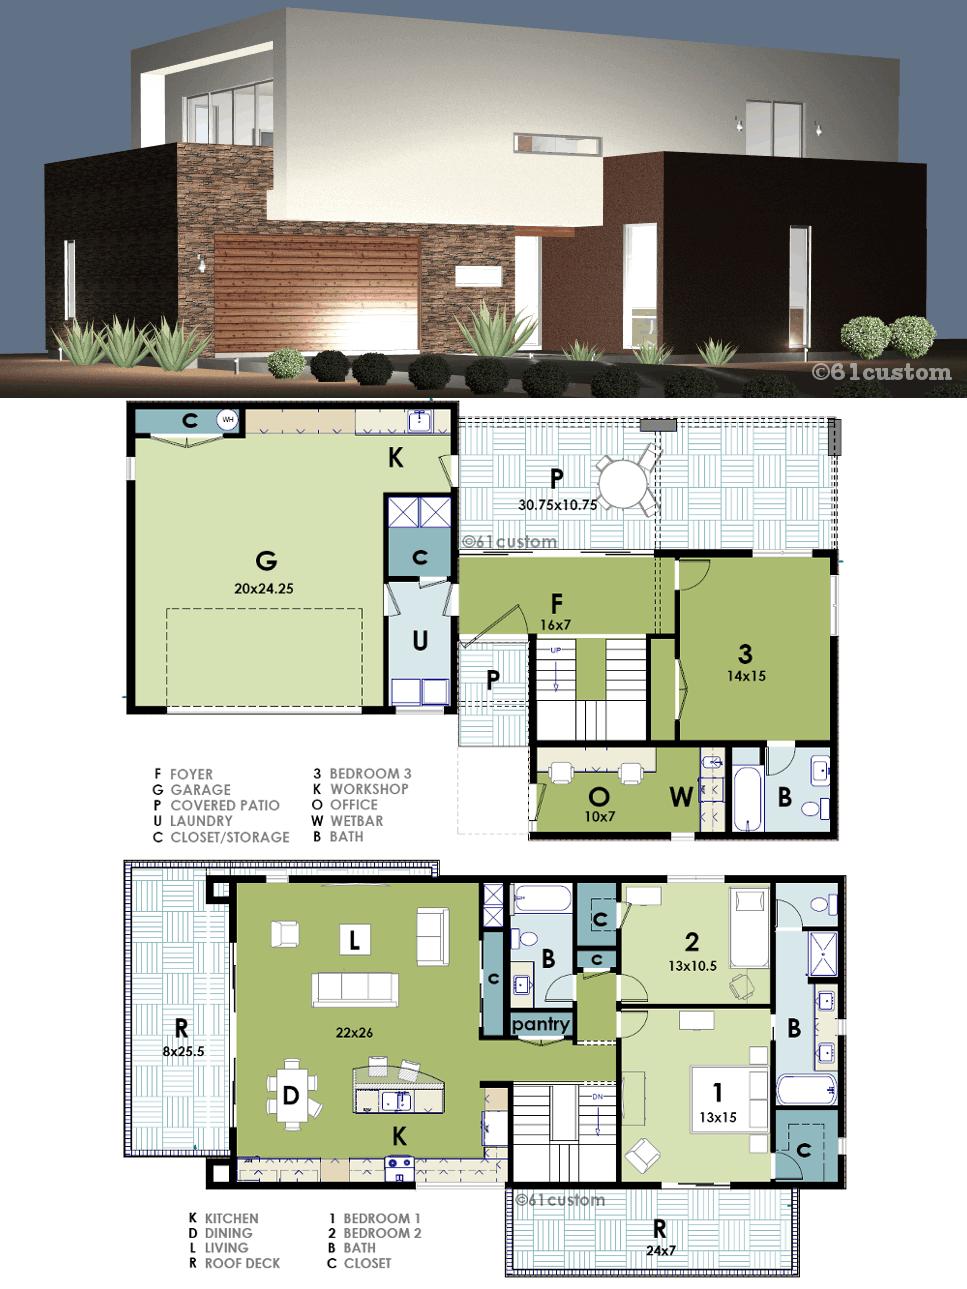 Modern Live Work House Plan 61custom In 2019 Modern